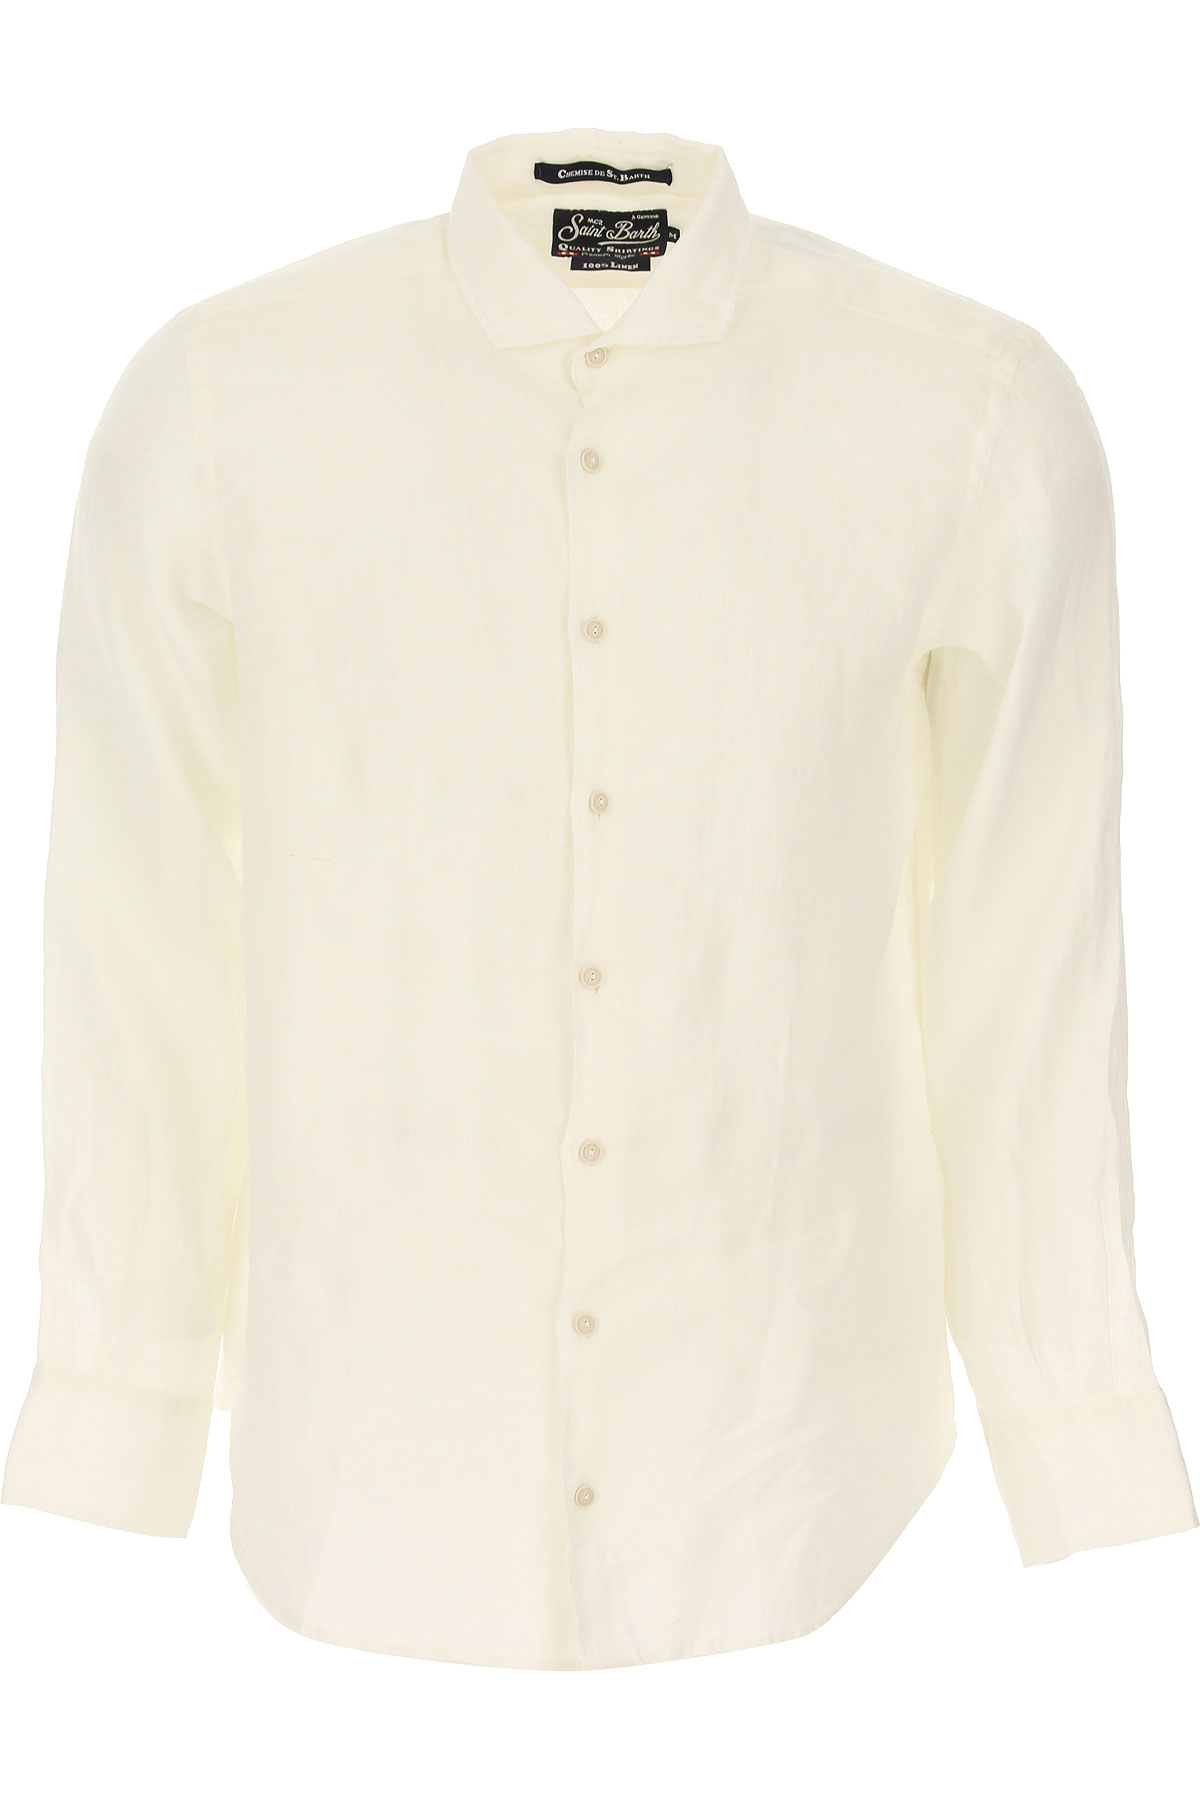 Mc2 Saint Barth Chemise Homme, Blanc, Lin, 2019, M S